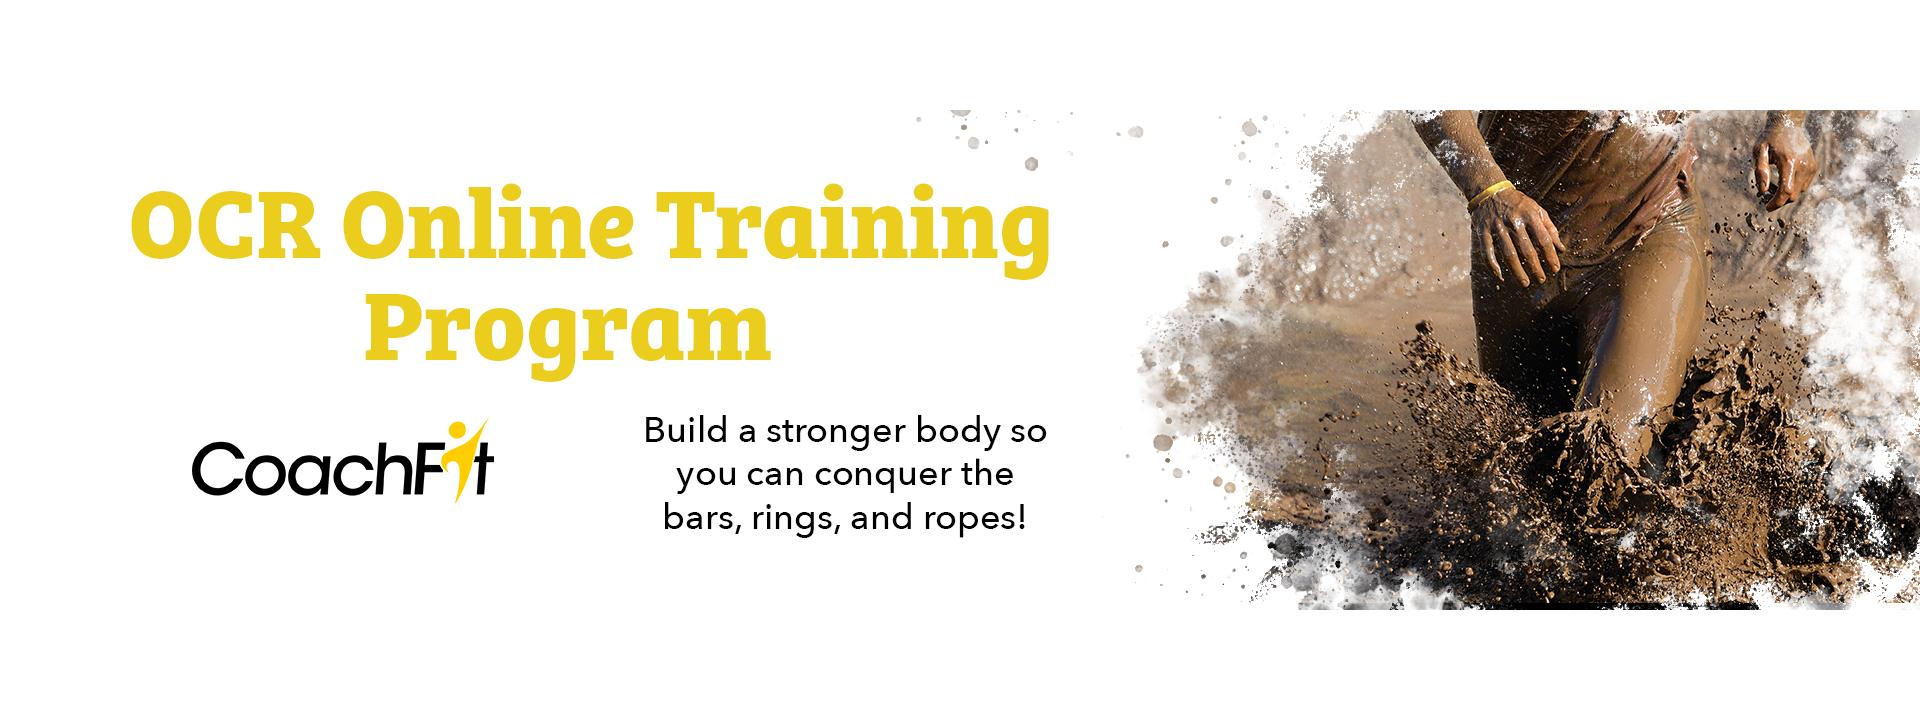 Spartan Race Online Training Dynamic Health Fitness